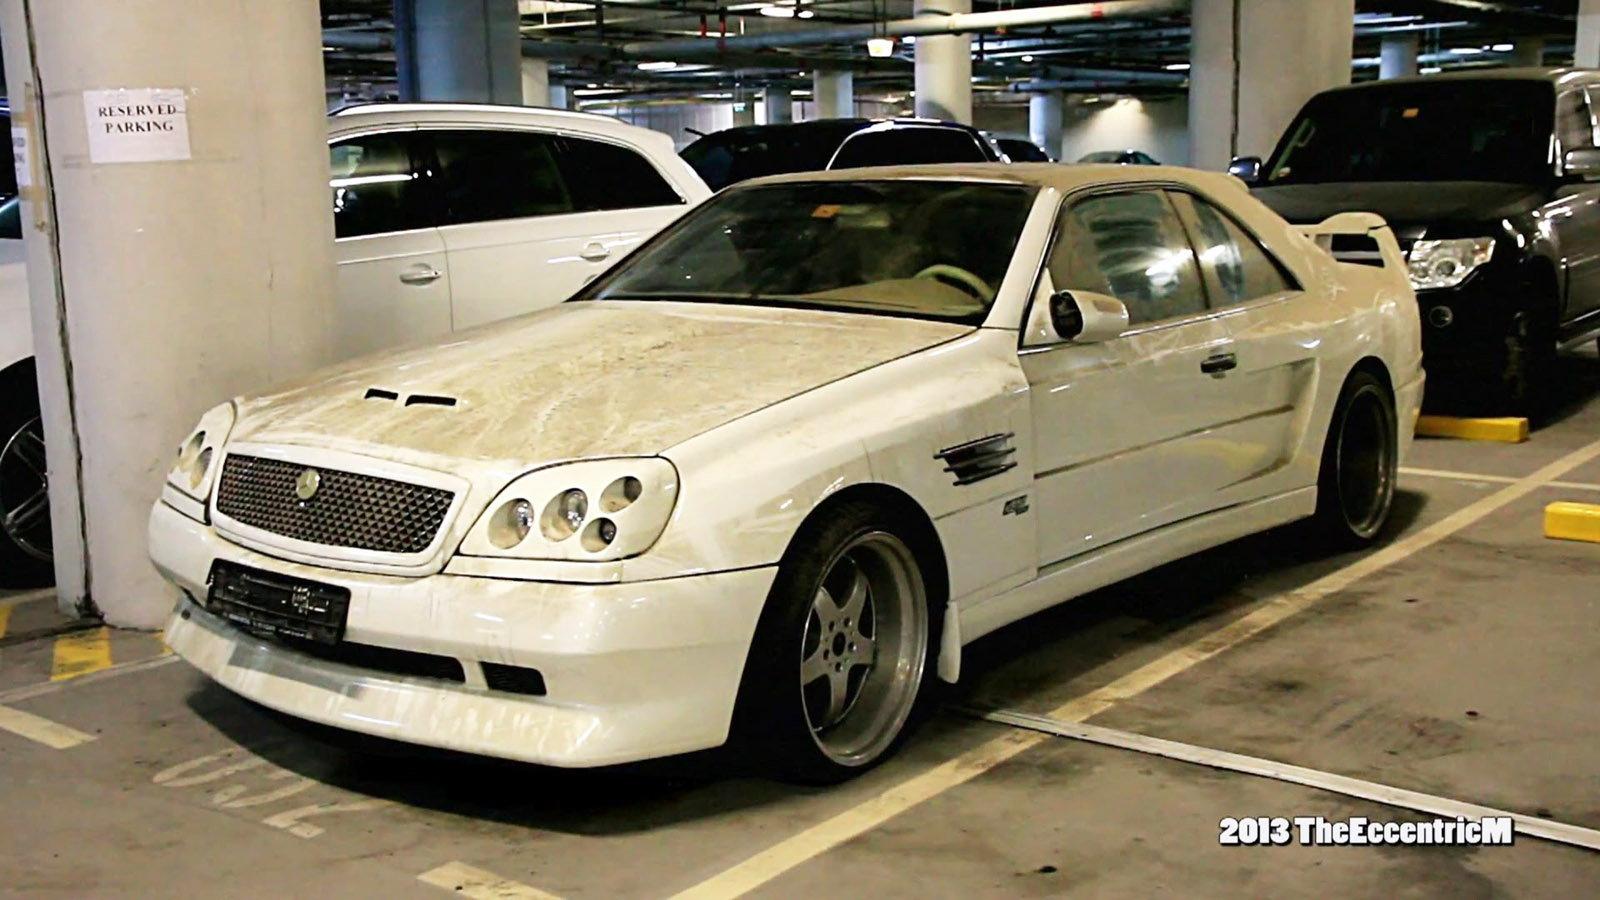 Koenig-Specials CL W140